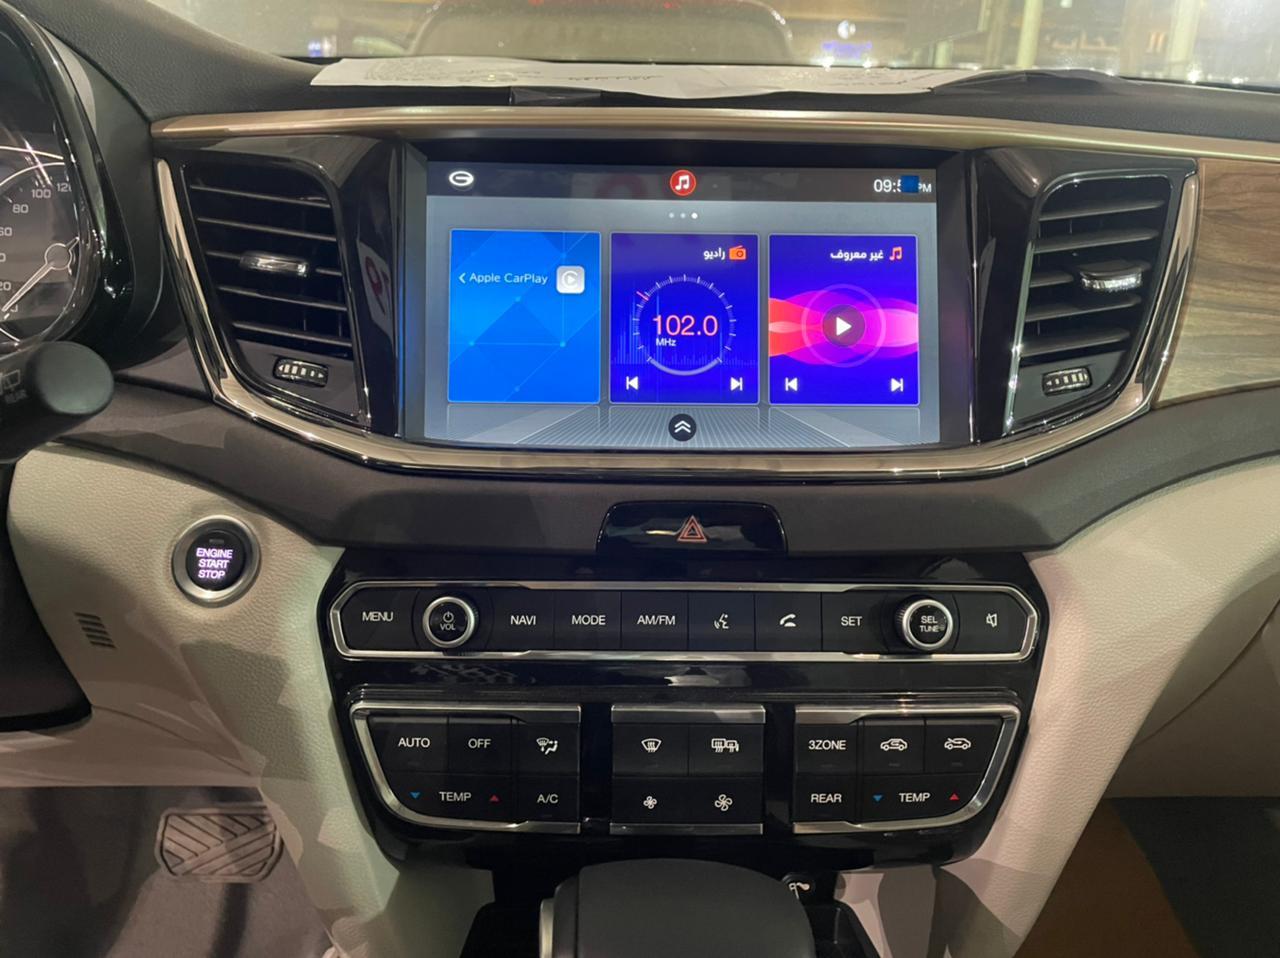 GAC فل  GS8  دبل 2020 سعودي جديد للبيع في جدة - السعودية - صورة كبيرة - 15